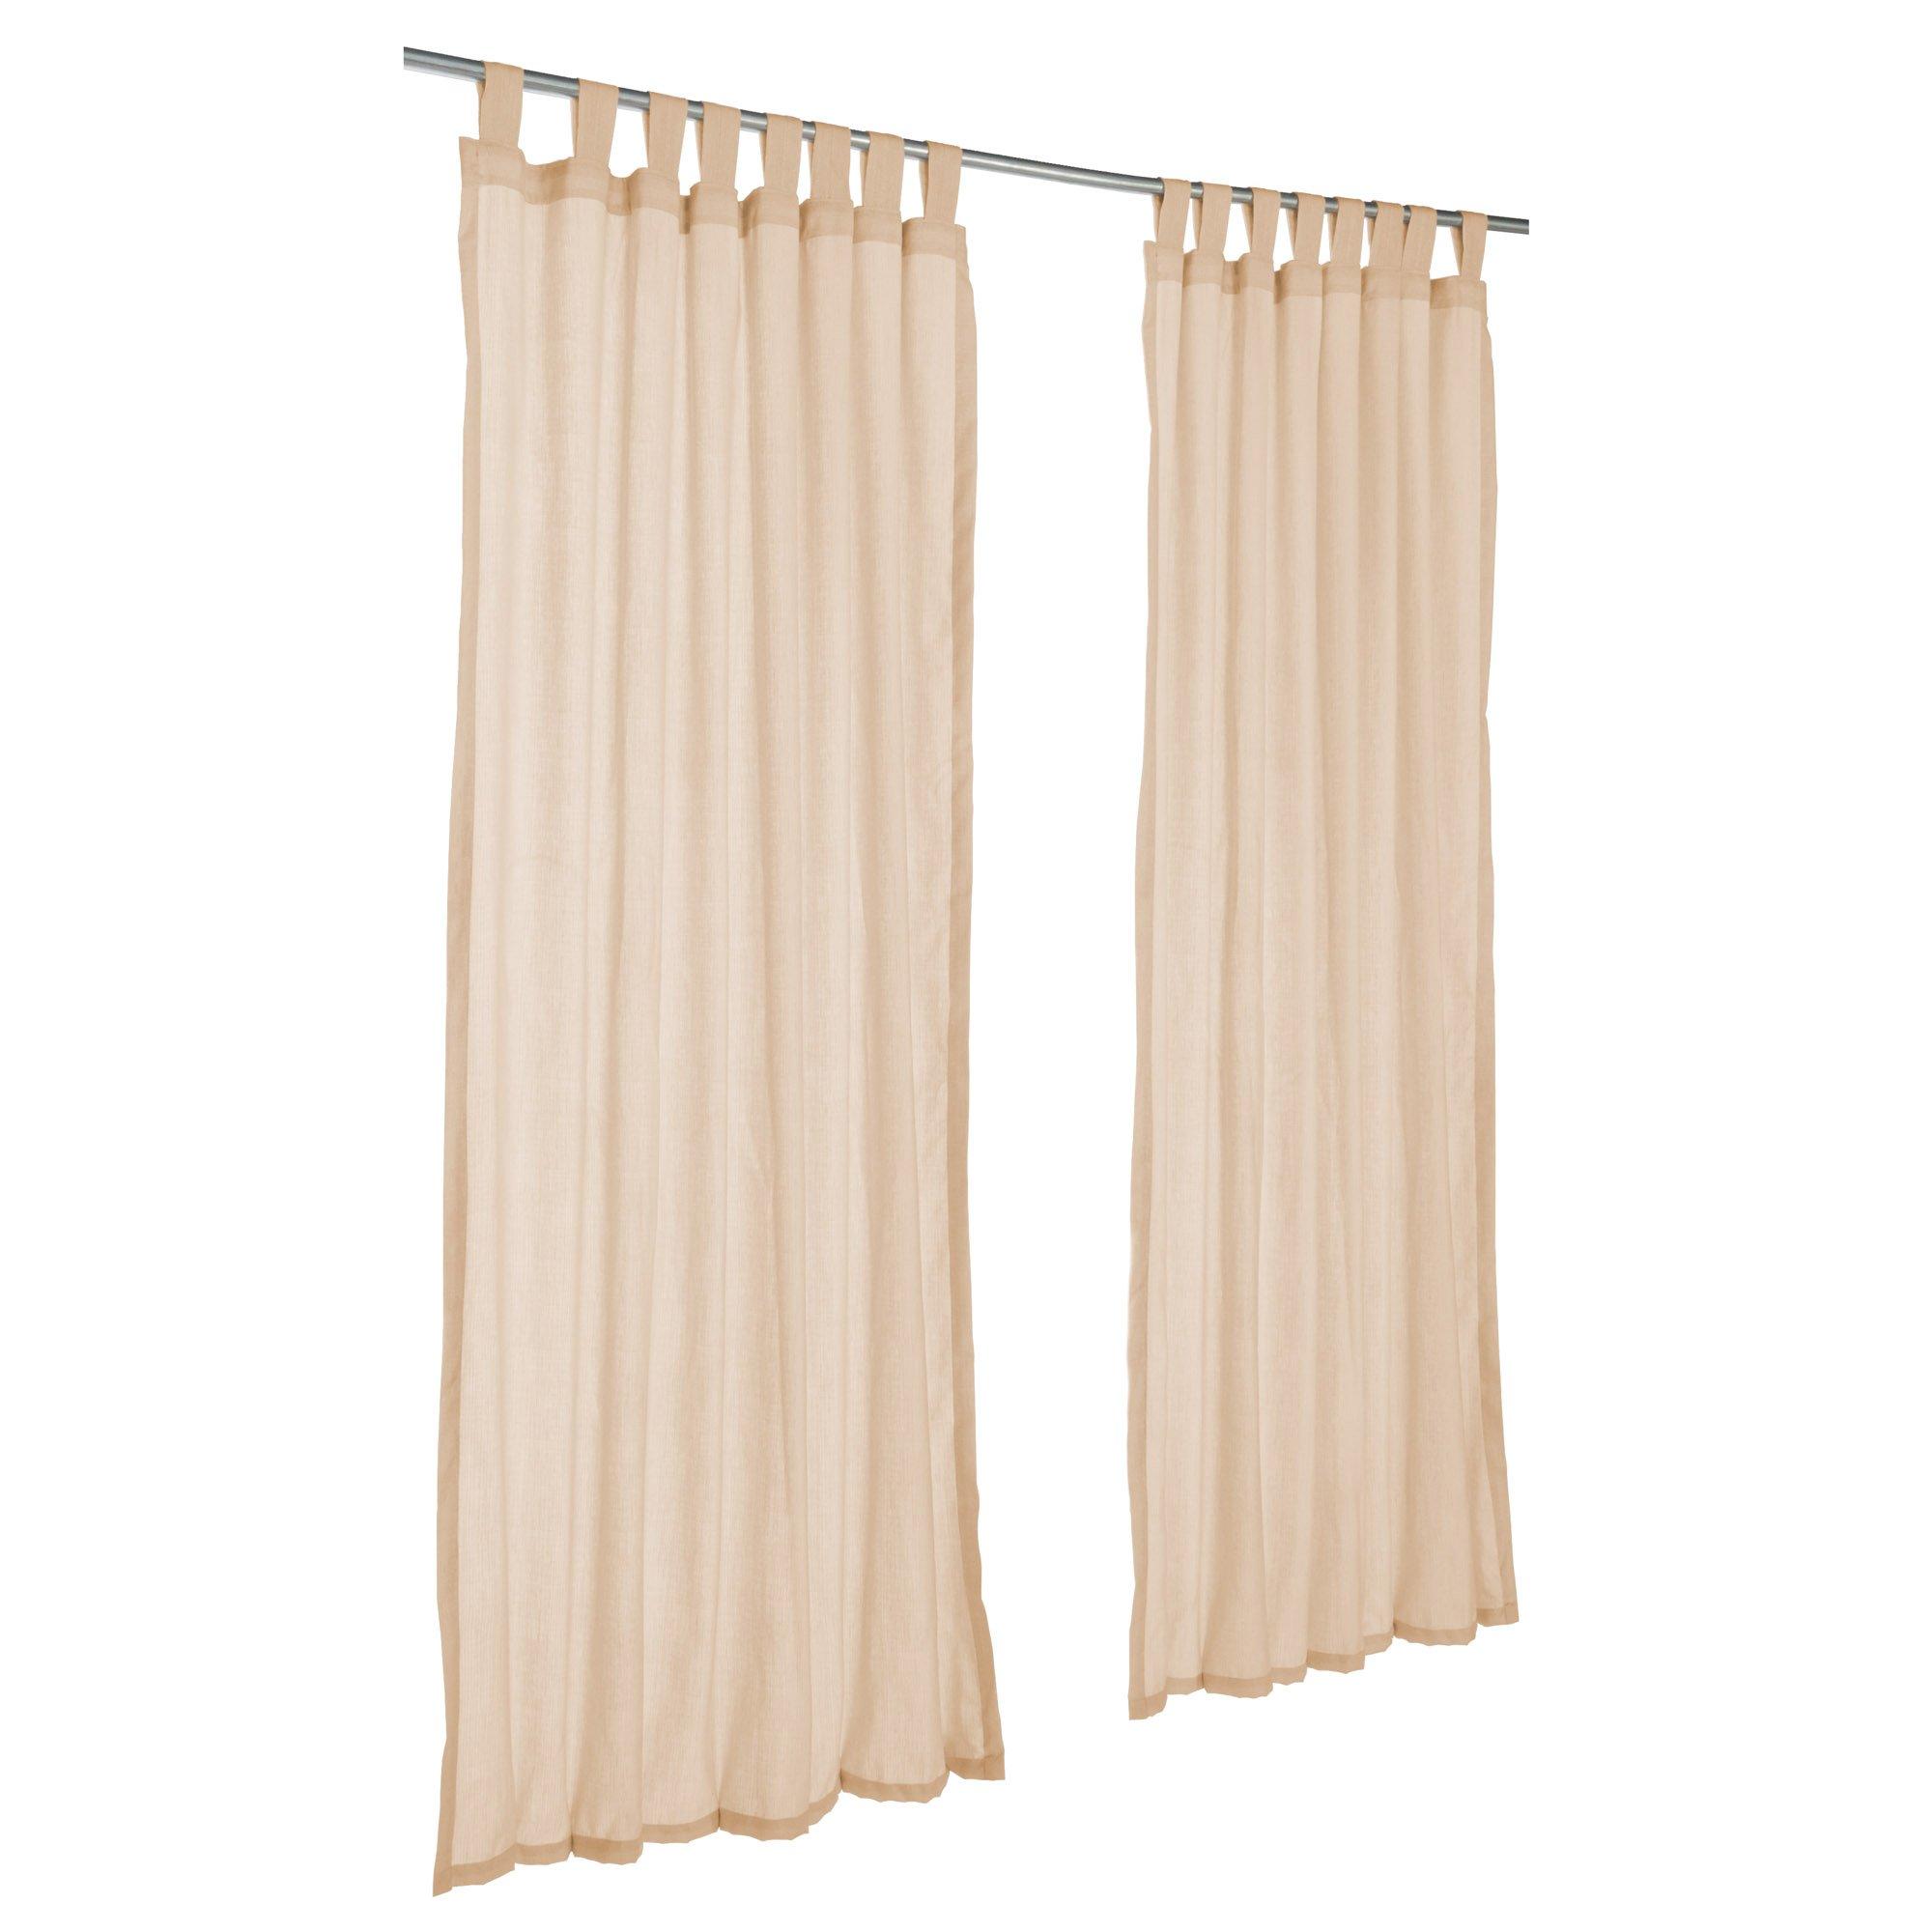 Pawleys Island Sunbrella Outdoor Gazebo Tabbed Sheer Curtain Panel Sheer Honey 50'' x 96''